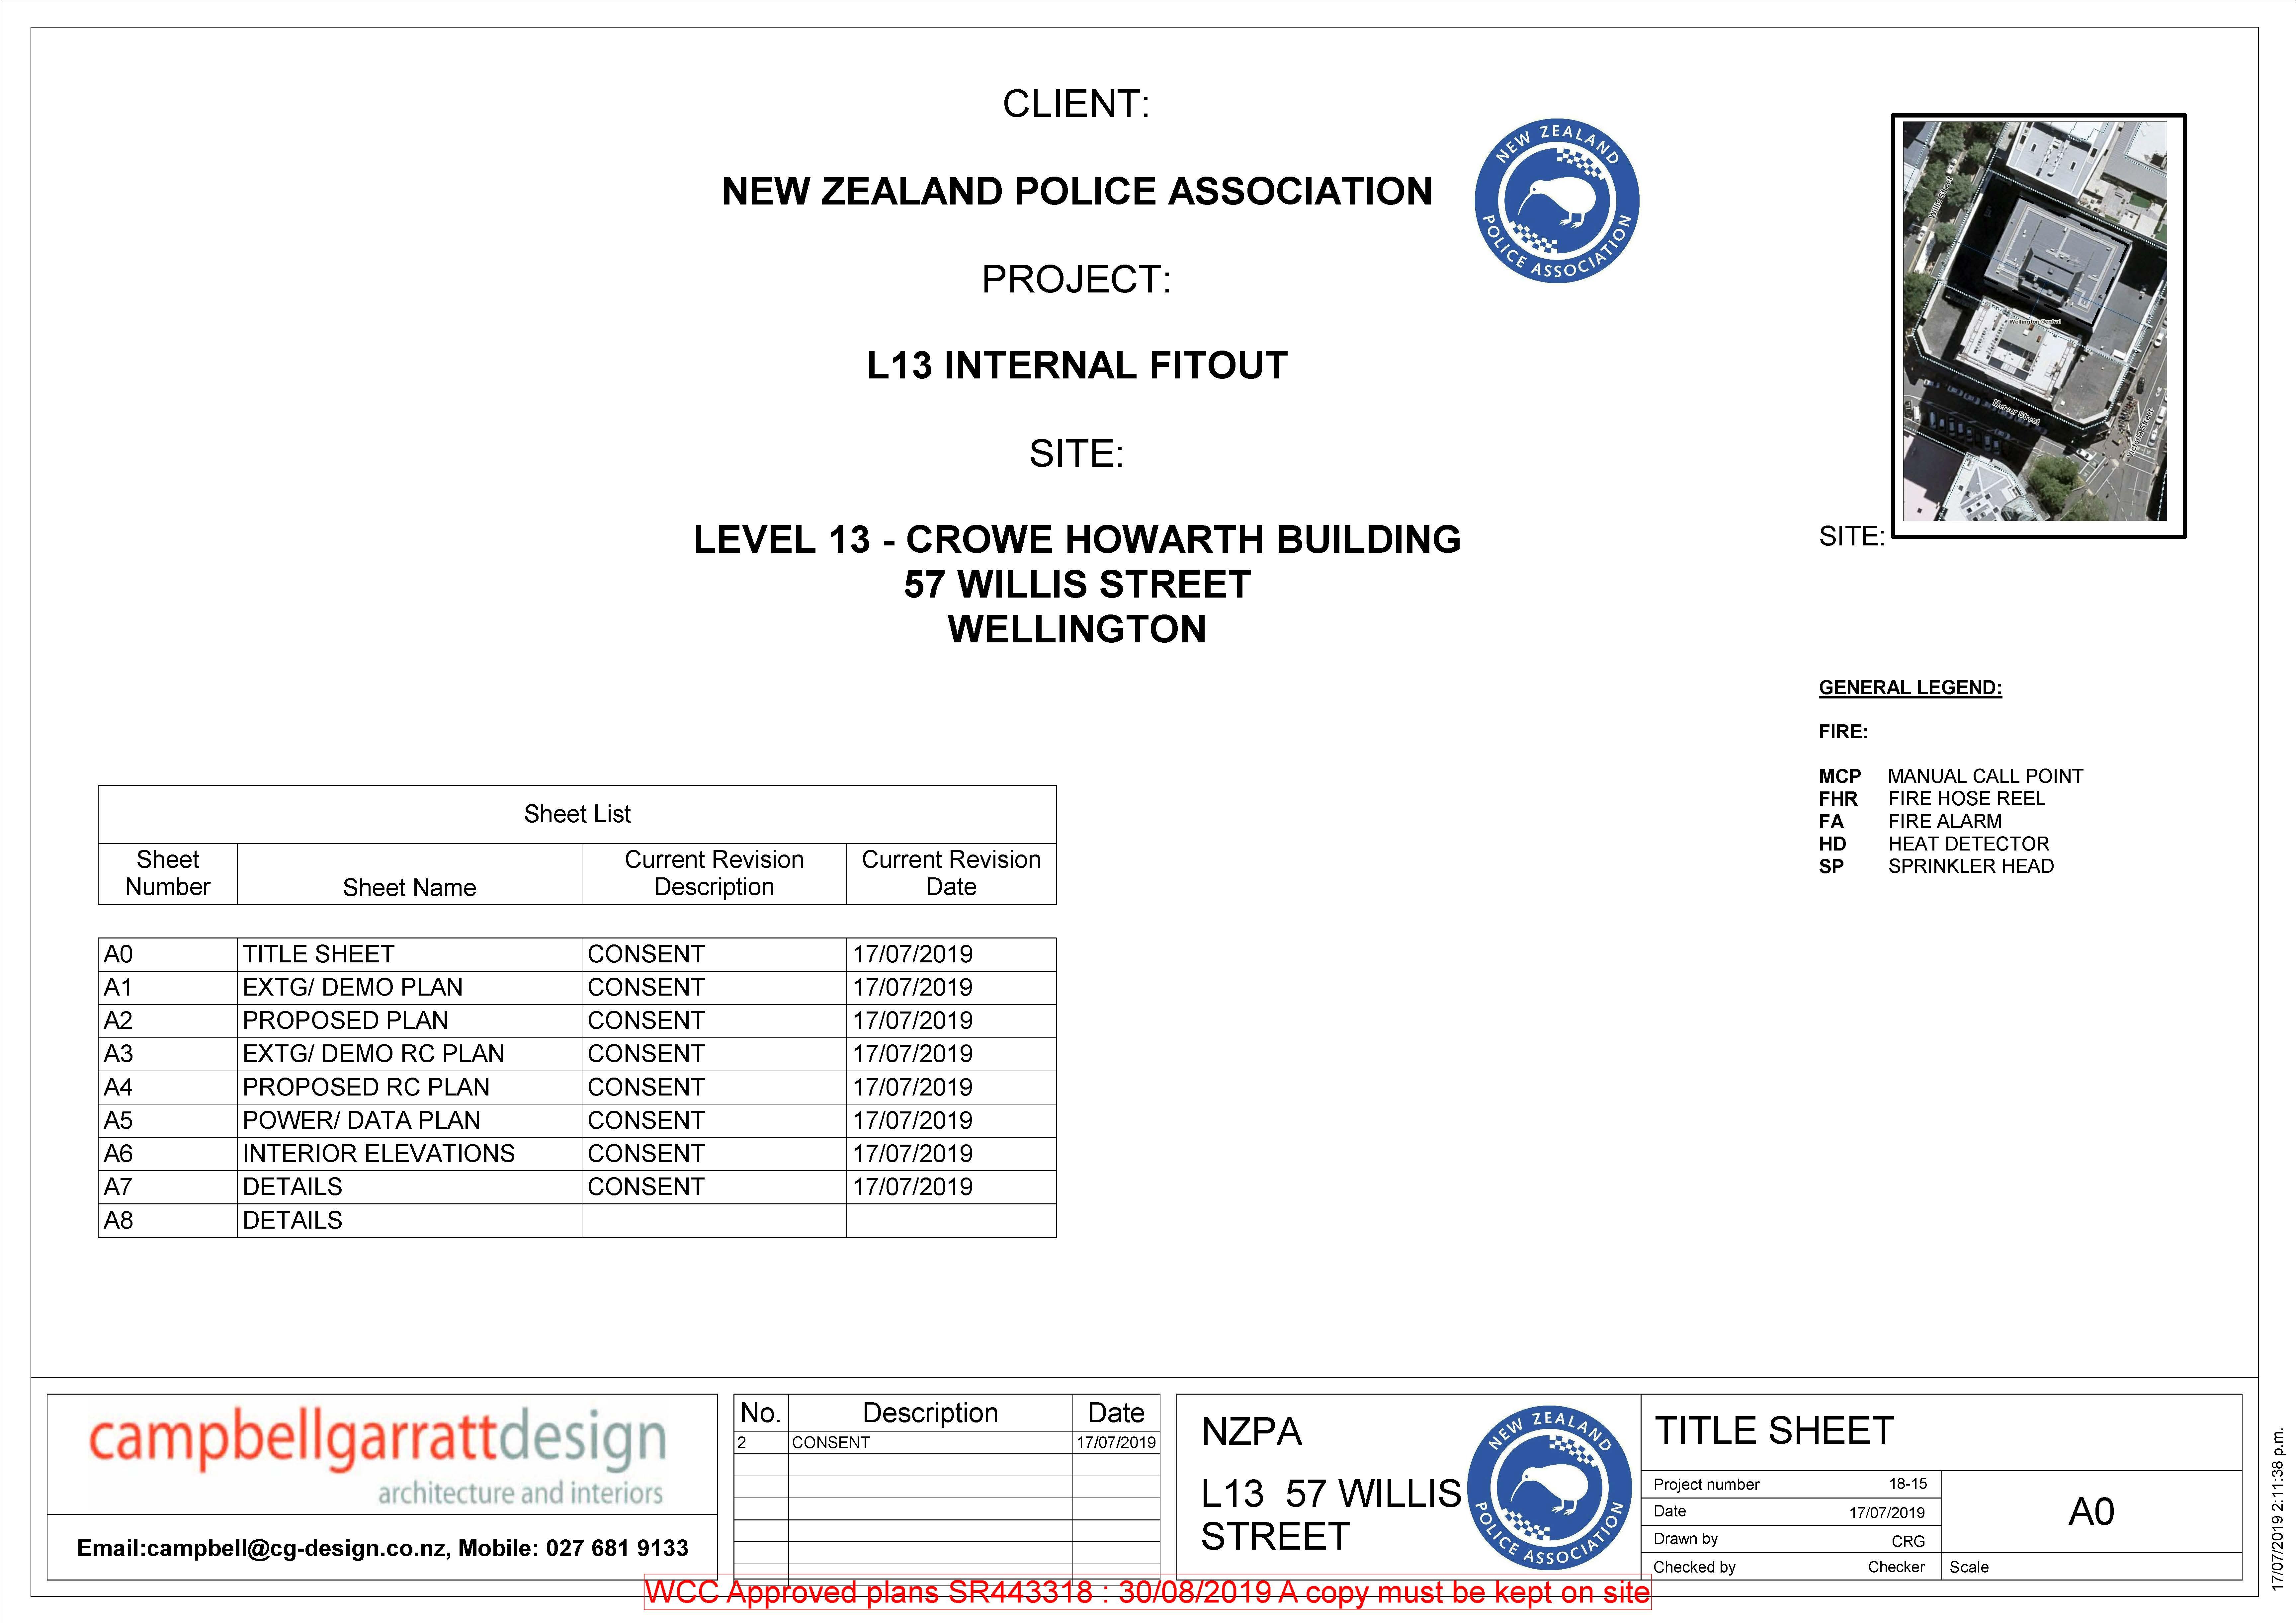 NZPA - Level 13, 57 Willis Street, Wellington